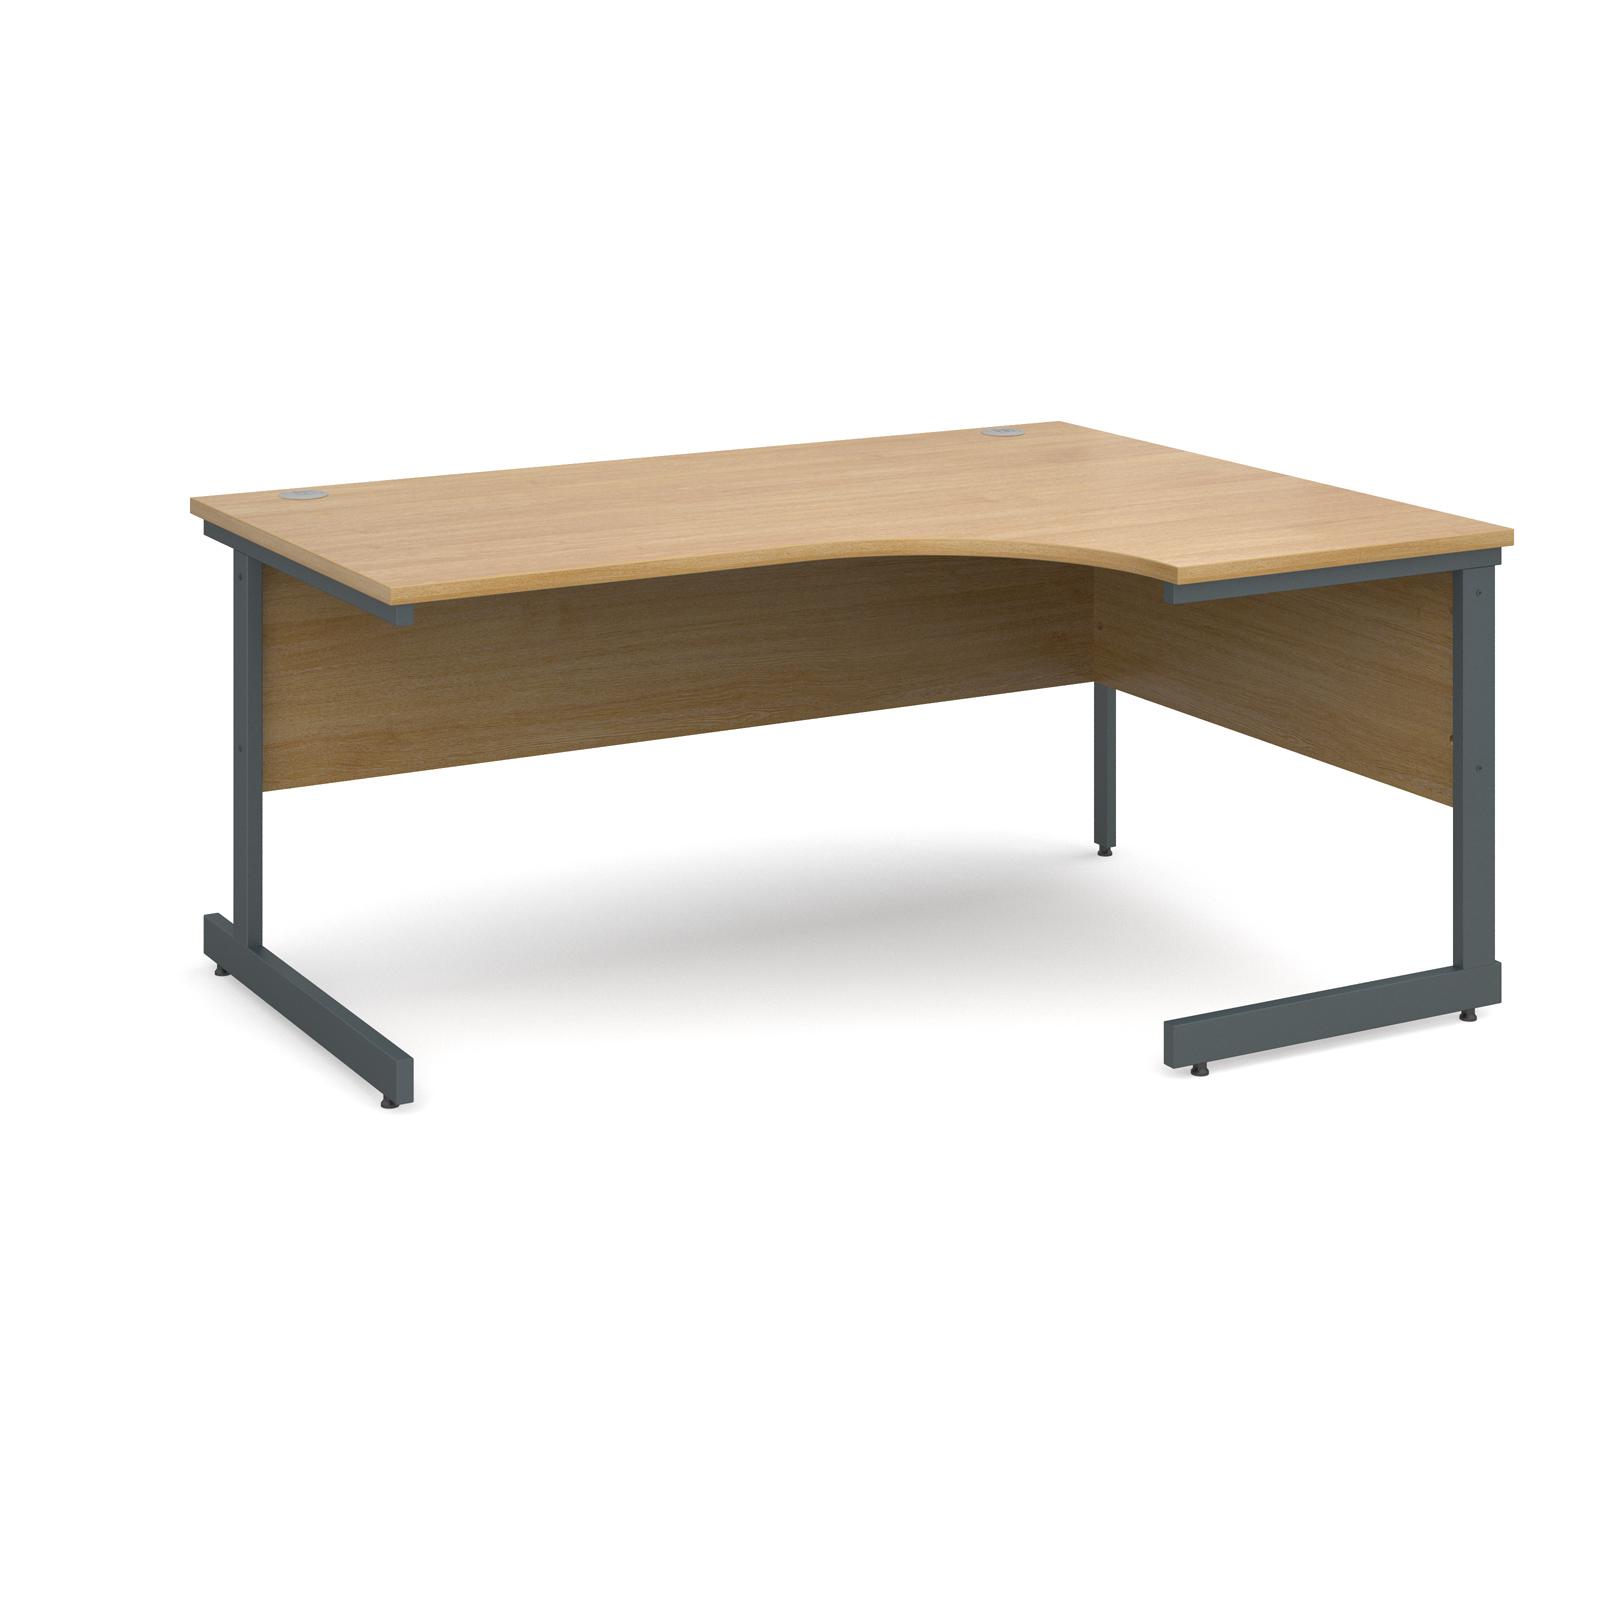 Contract 25 right hand ergonomic desk 1600mm - graphite cantilever frame, oak top